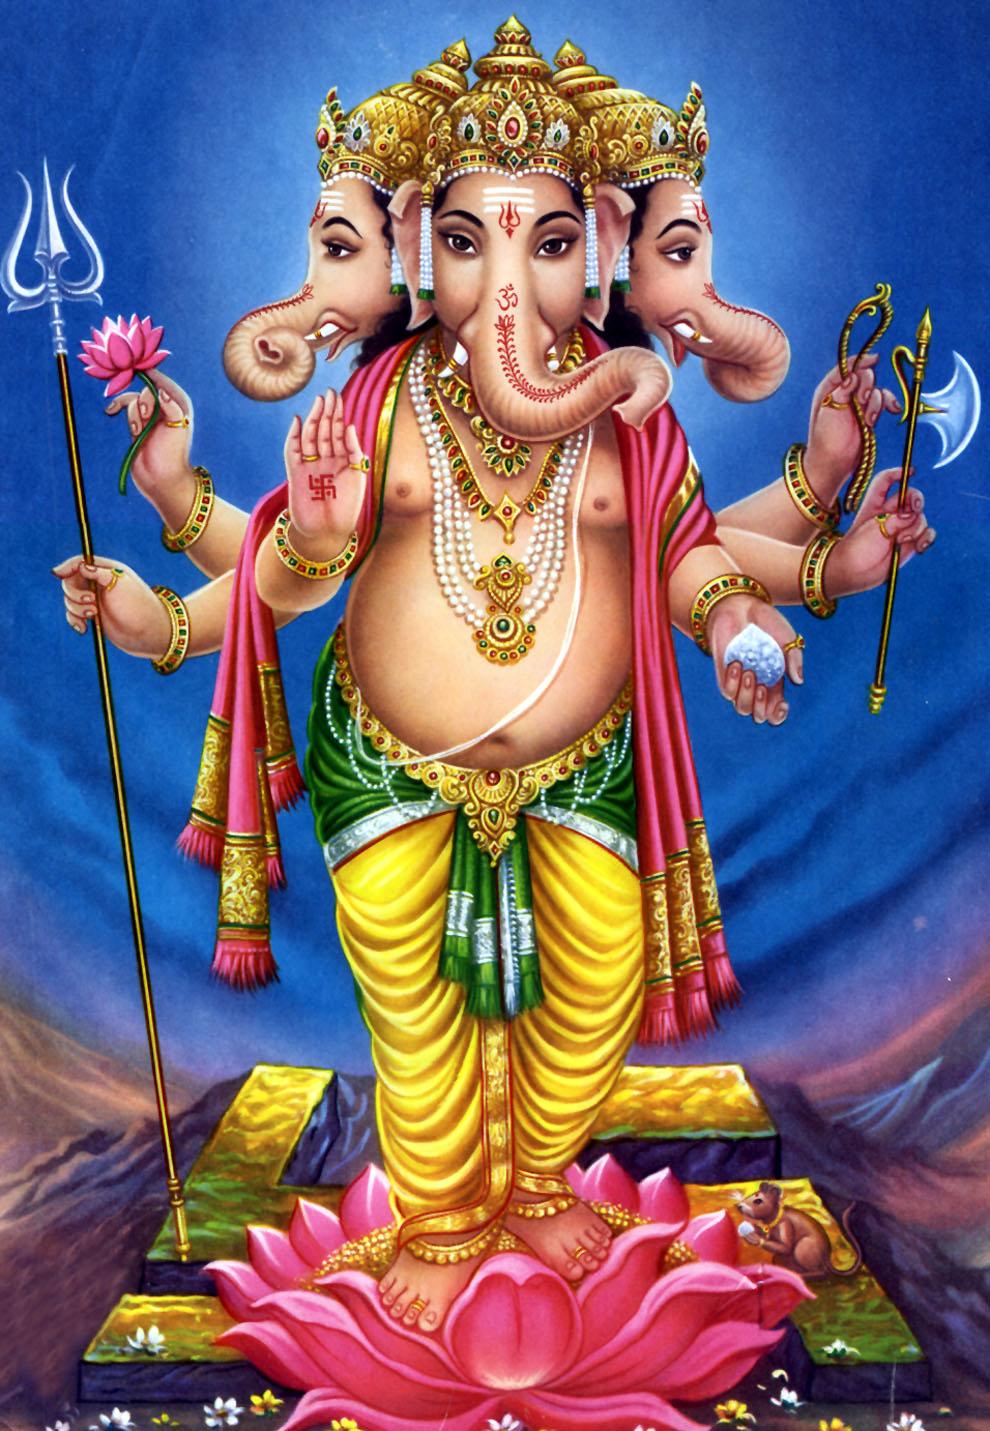 Bhagwan ji help me lord shri ganesh latest hd wallpapers gallery - Shri ganesh hd photo ...